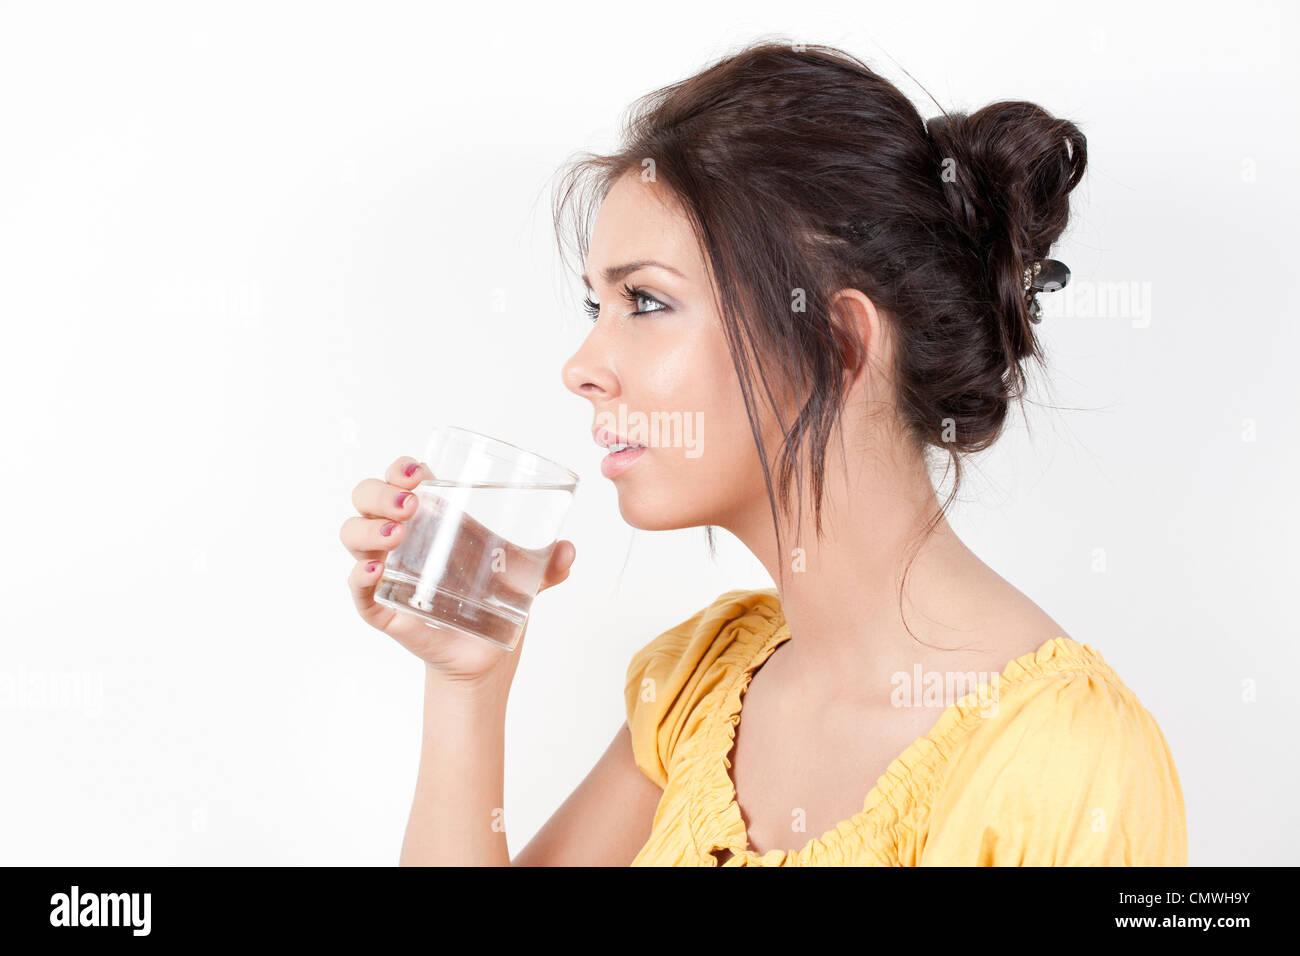 Mujer agua potable - MR Imagen De Stock